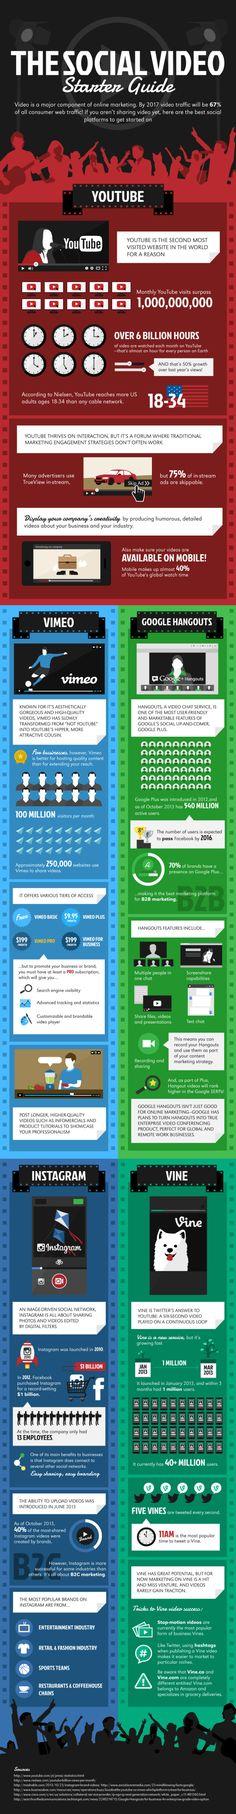 The social video #infographic #socialmedia